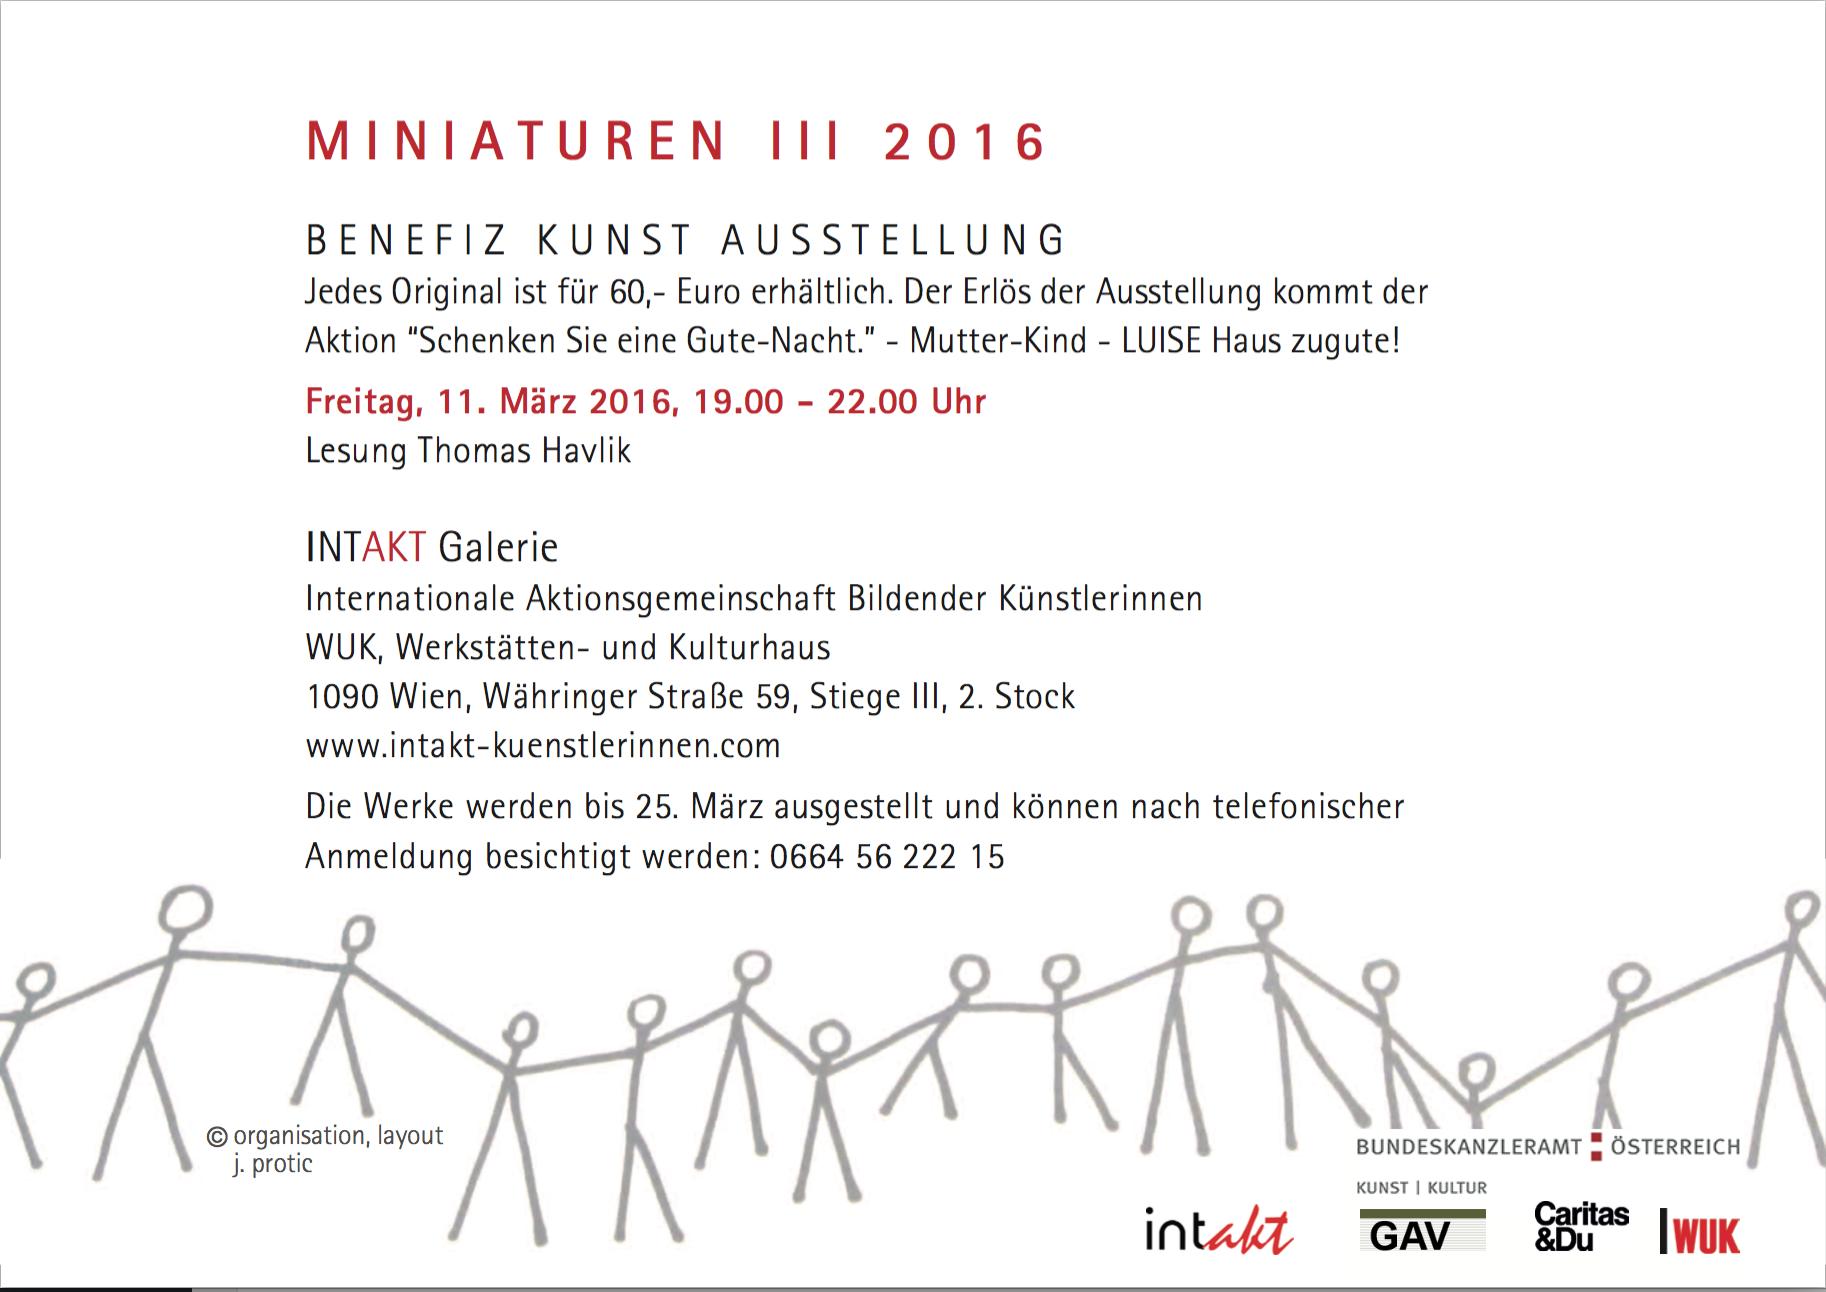 Miniaturen III 2016 / 11.3.2016